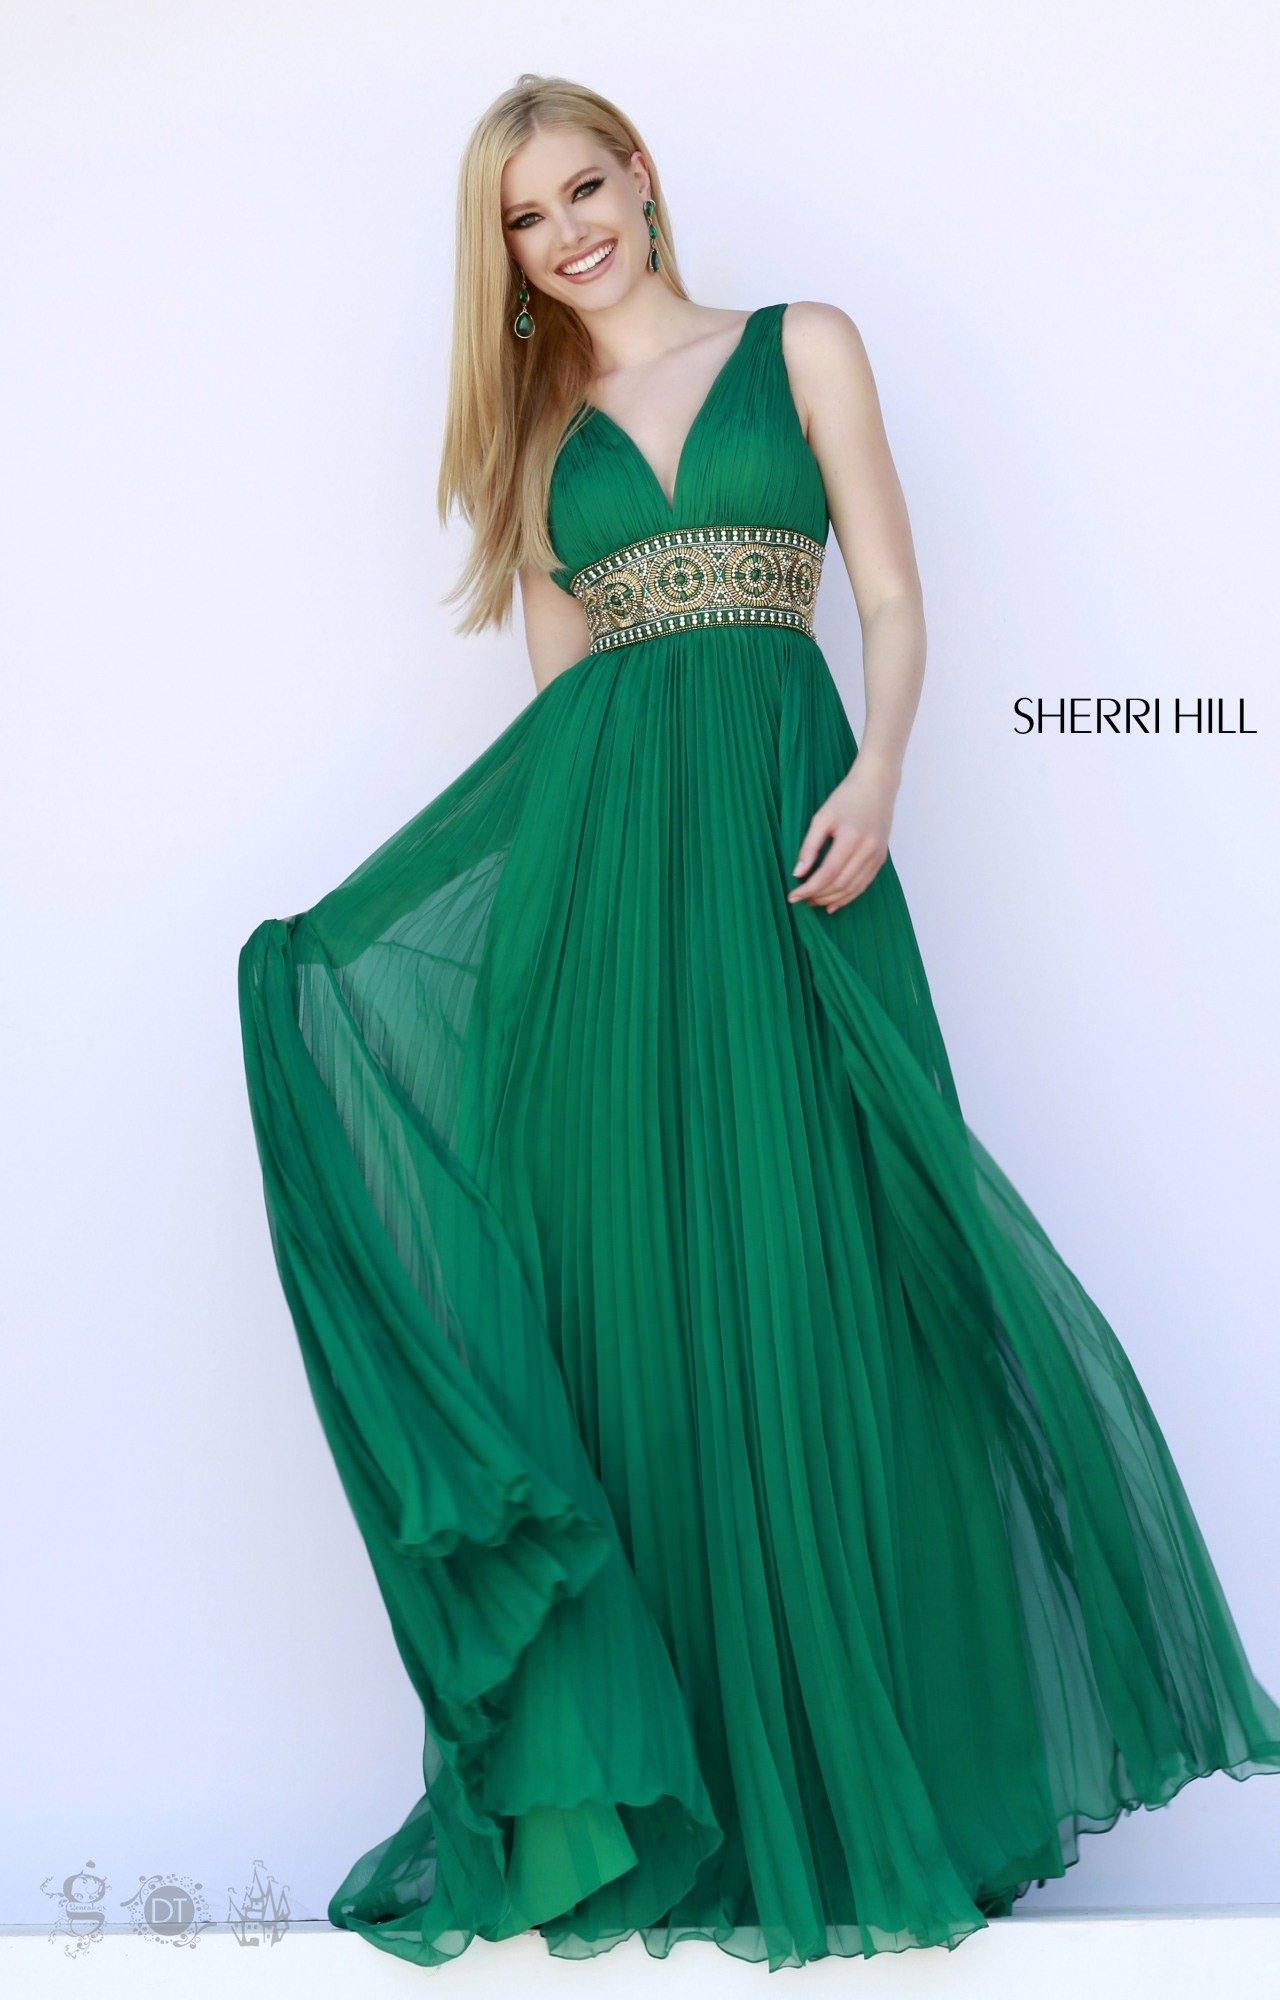 Sherri Hill 11189 - Accordion to Me Dress Prom Dress